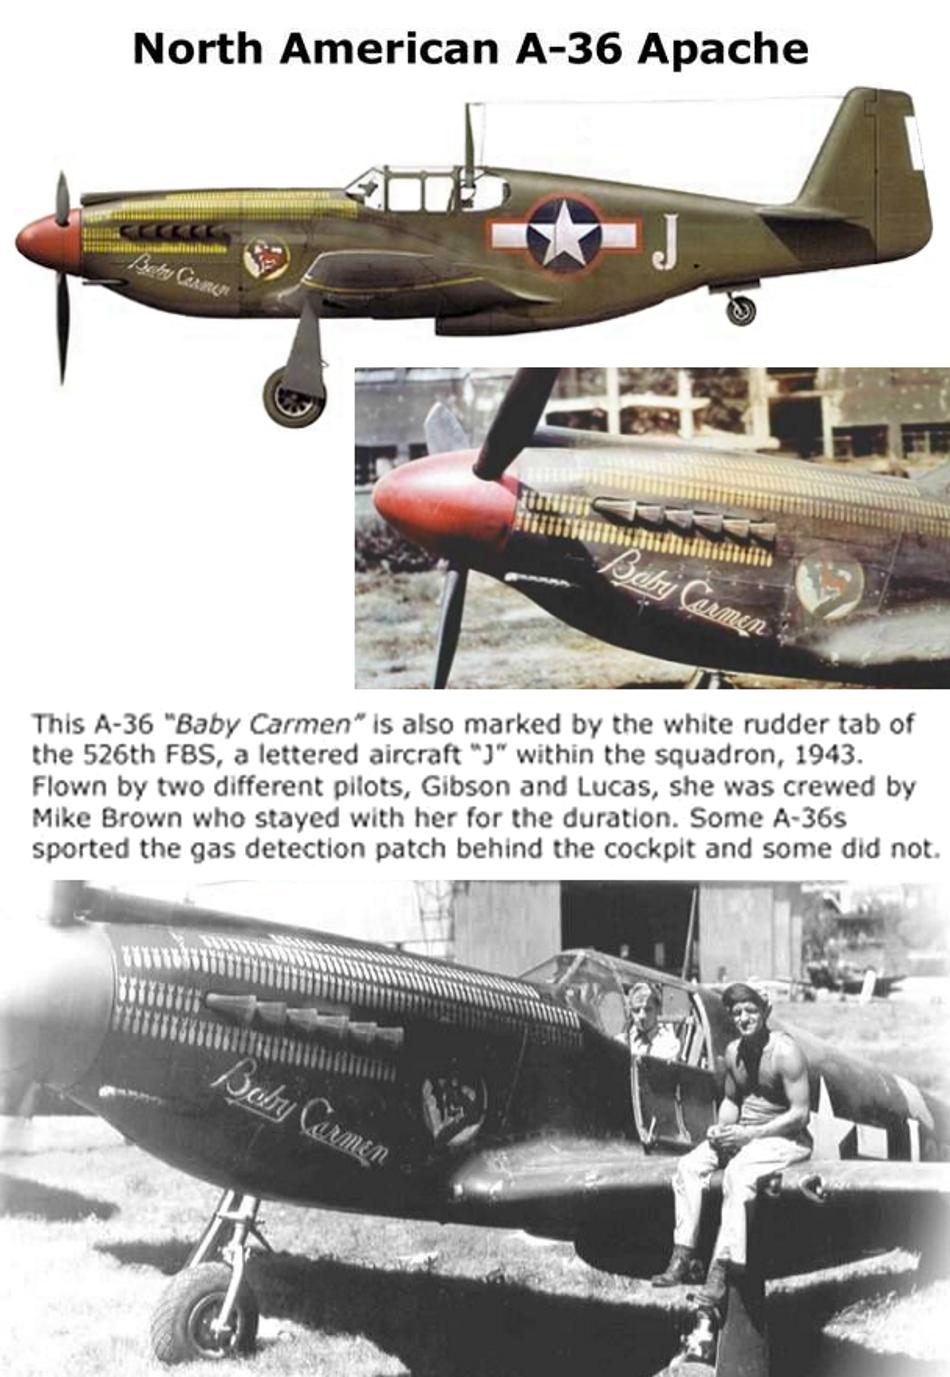 NORTH AMERICAN P-51 MUSTANG P51a-111